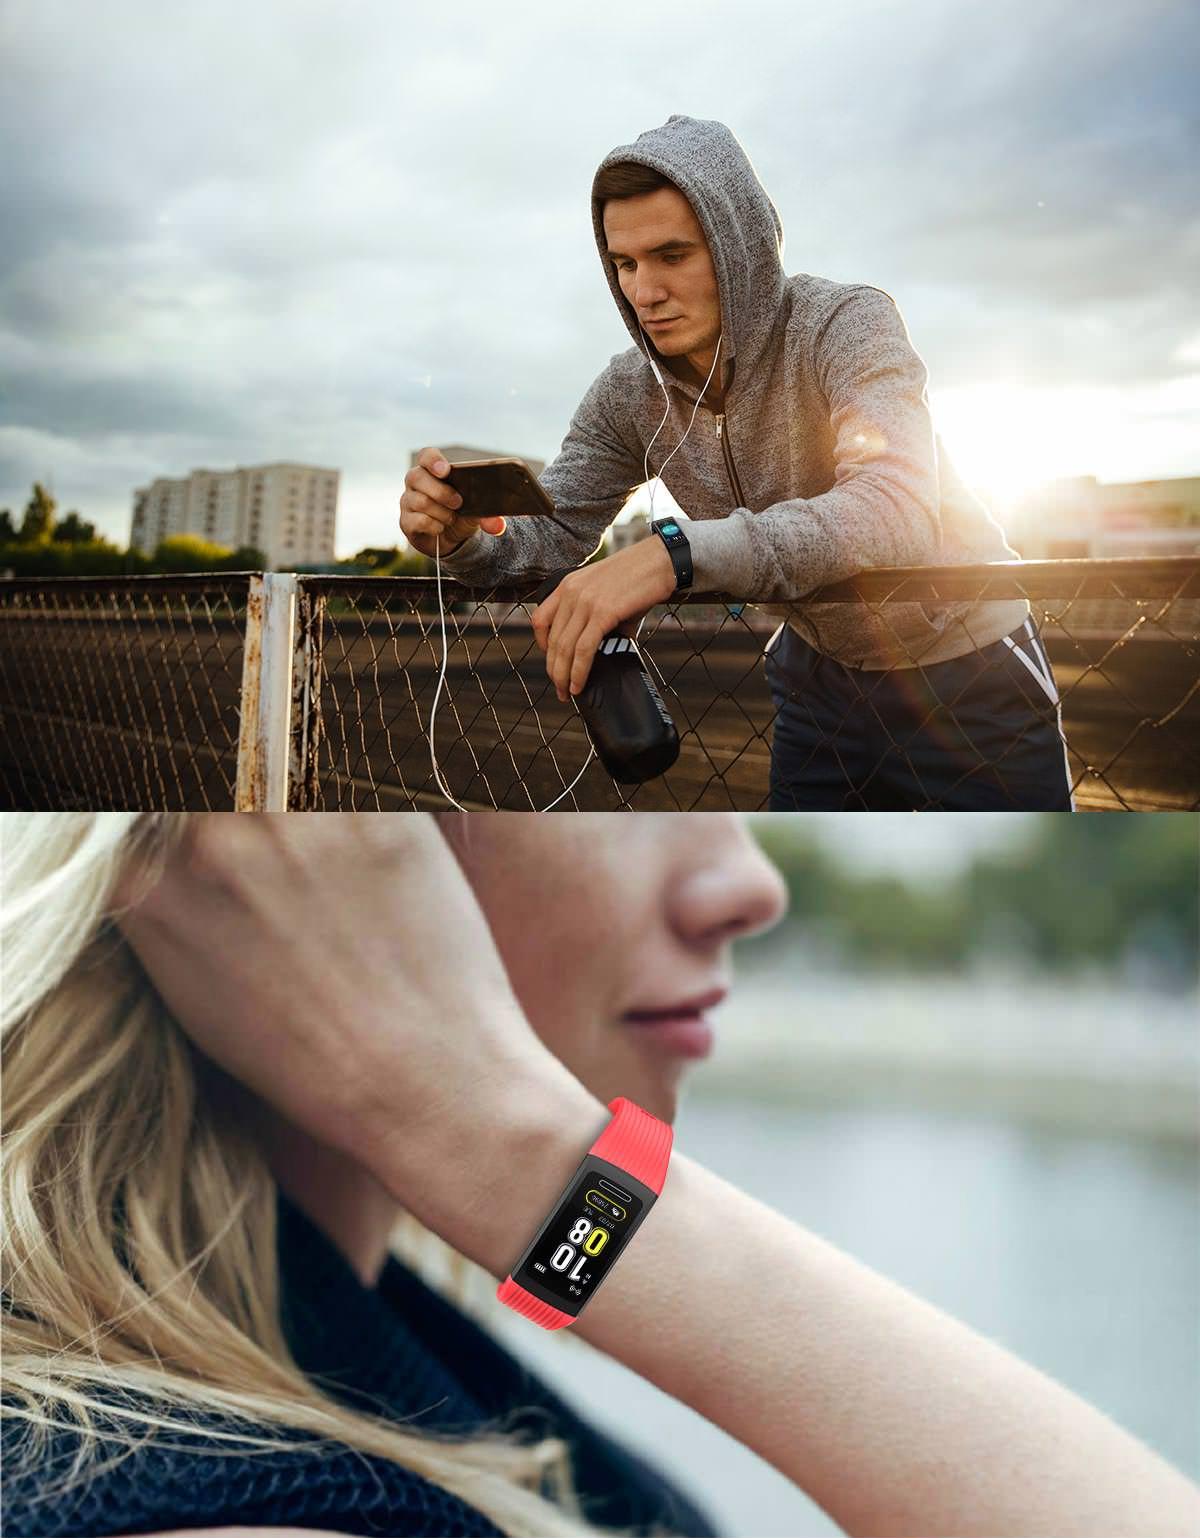 r10 1.14 inch sports smart bracelet review